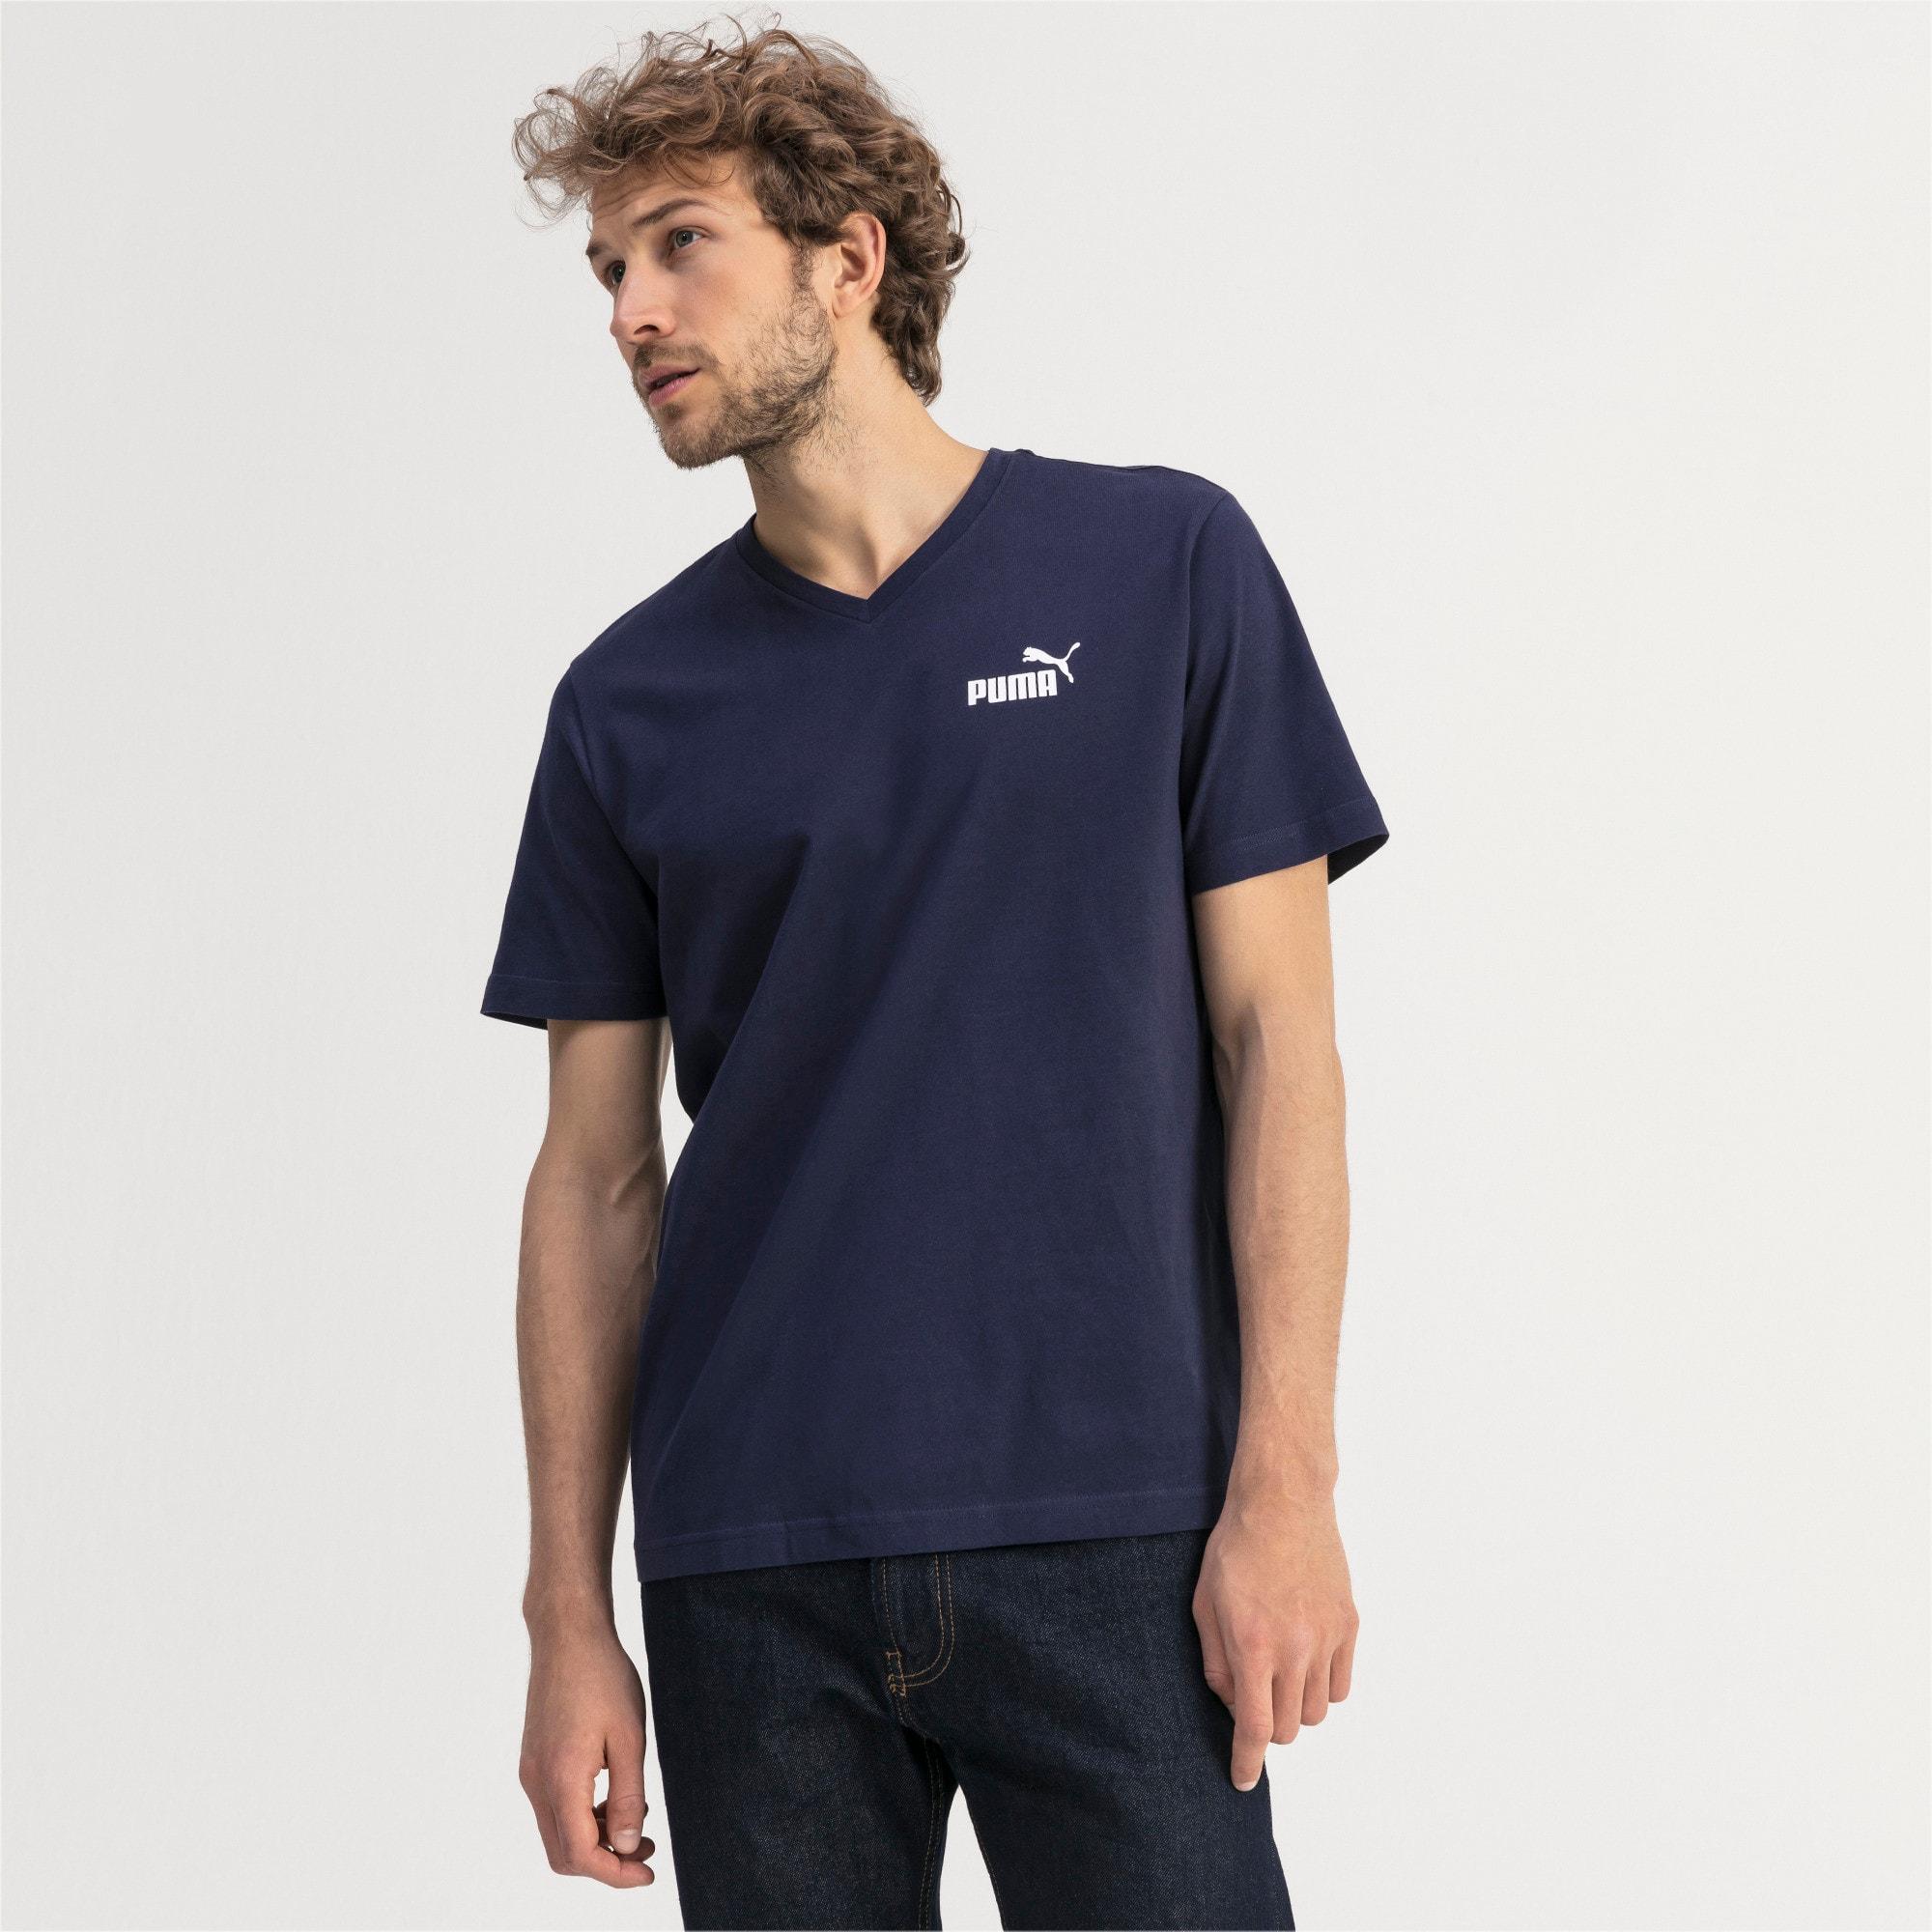 Thumbnail 1 of T-shirt con scollo a V Essentials uomo, Peacoat, medium